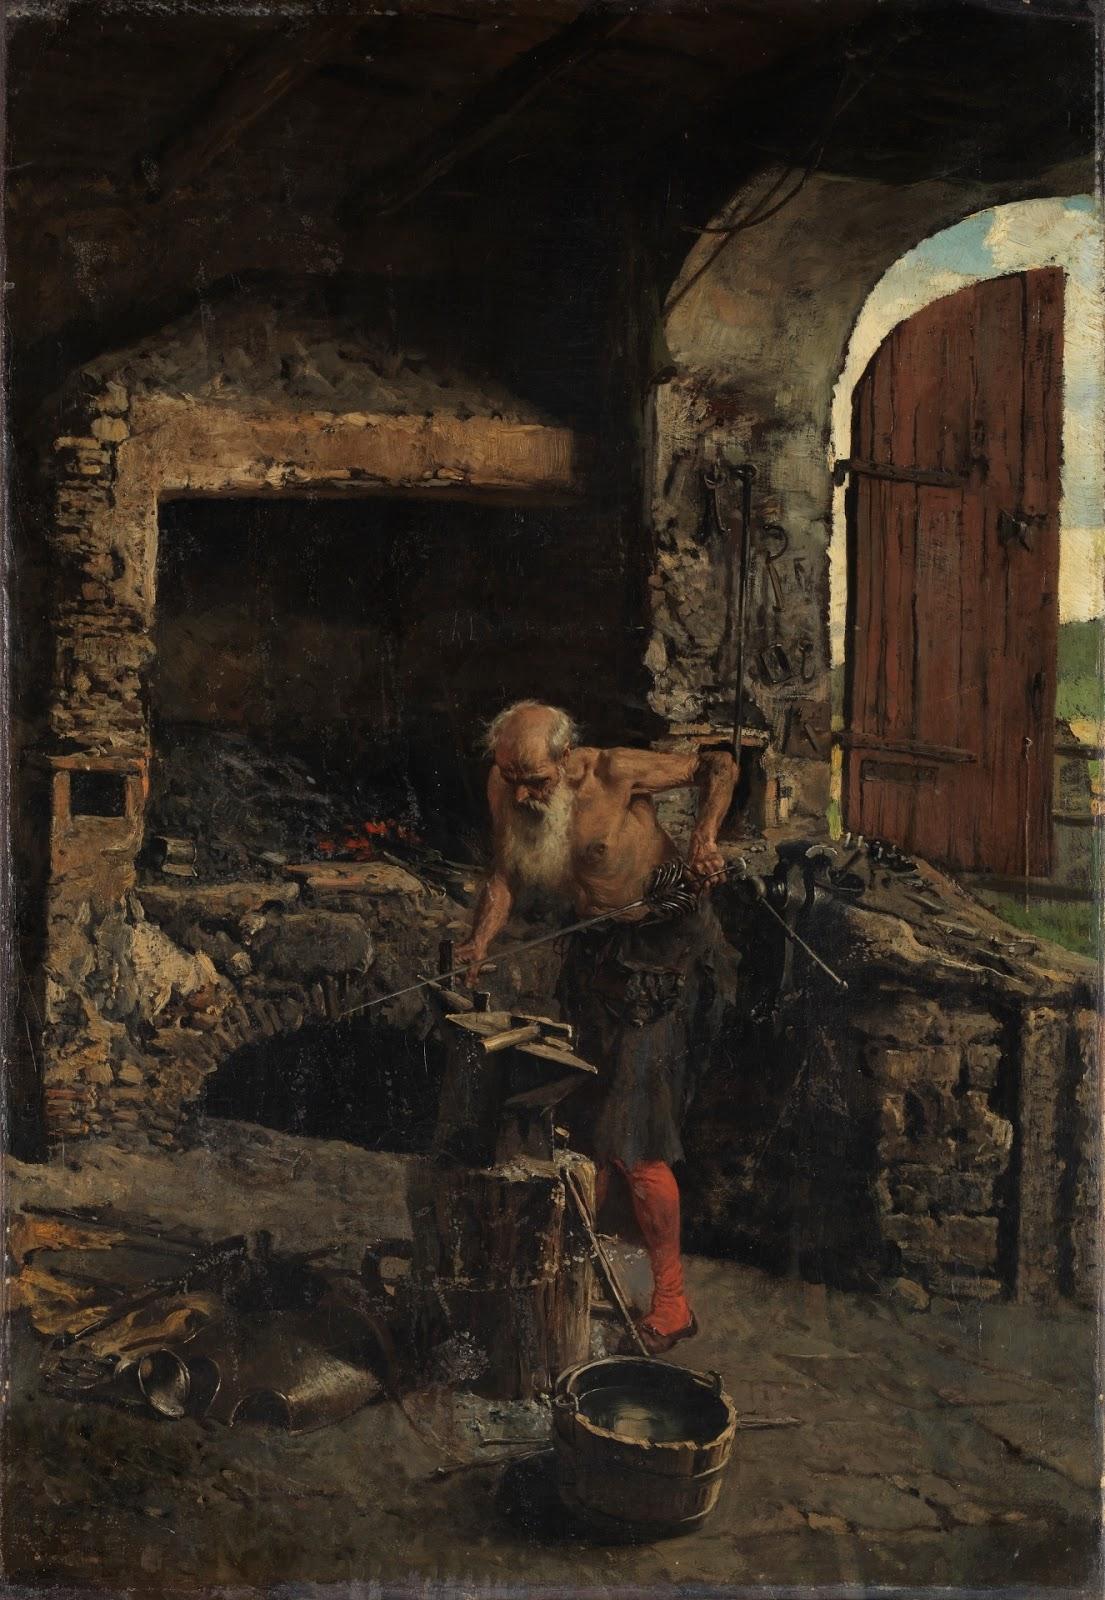 MARIANO FORTUNY Y MARSAL - O espadeiro - Óleo sobre tela - 75 x 52 - 1867.jpg